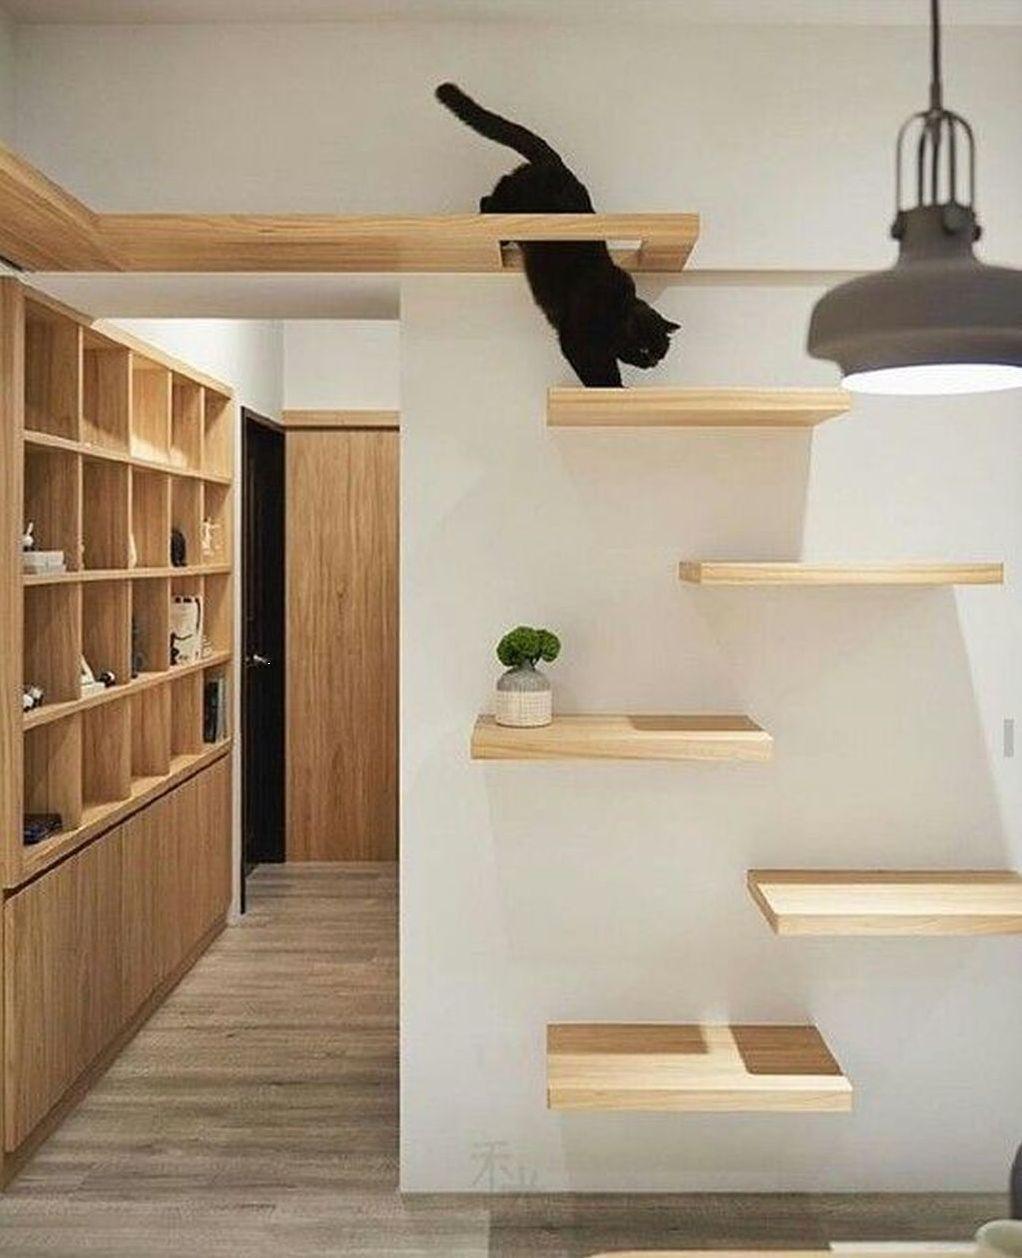 12 Modern Cat Furniture Ideas Cat Wall Shelves Cat Room Cat Decor